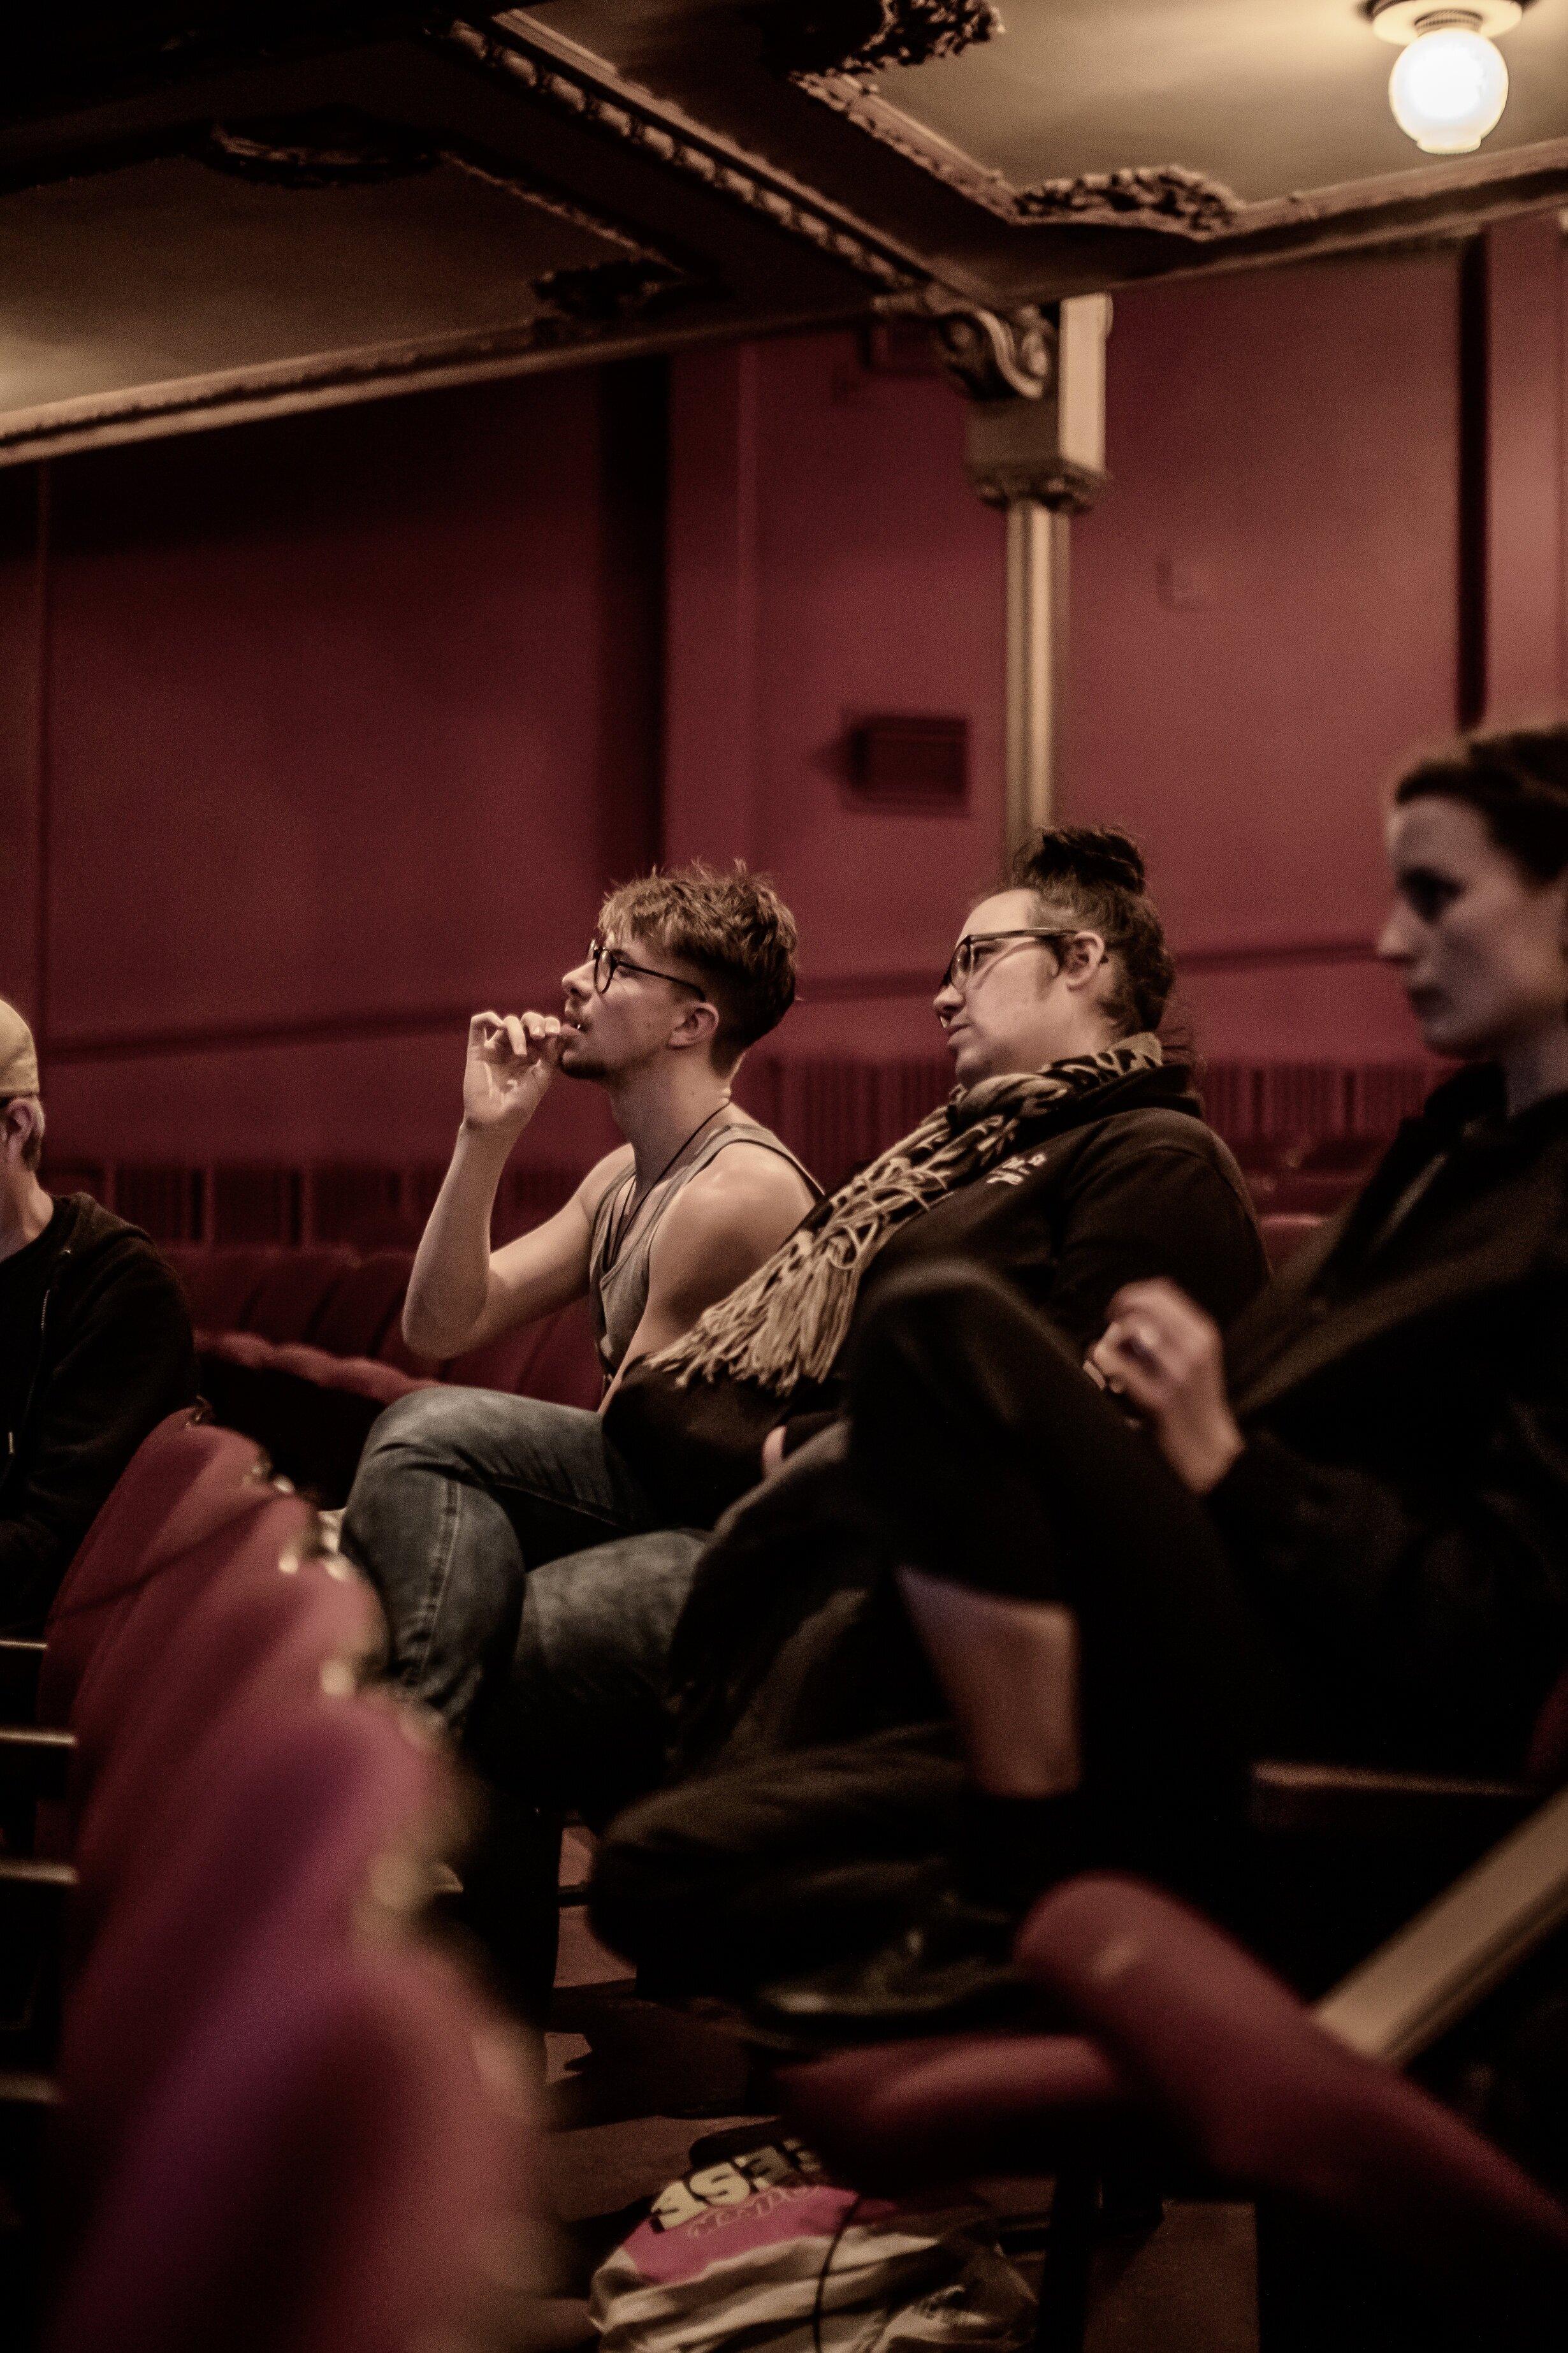 Loughlan Pryor & Marie Silberstein at the Opera House. Photograph: Tim Hamilton